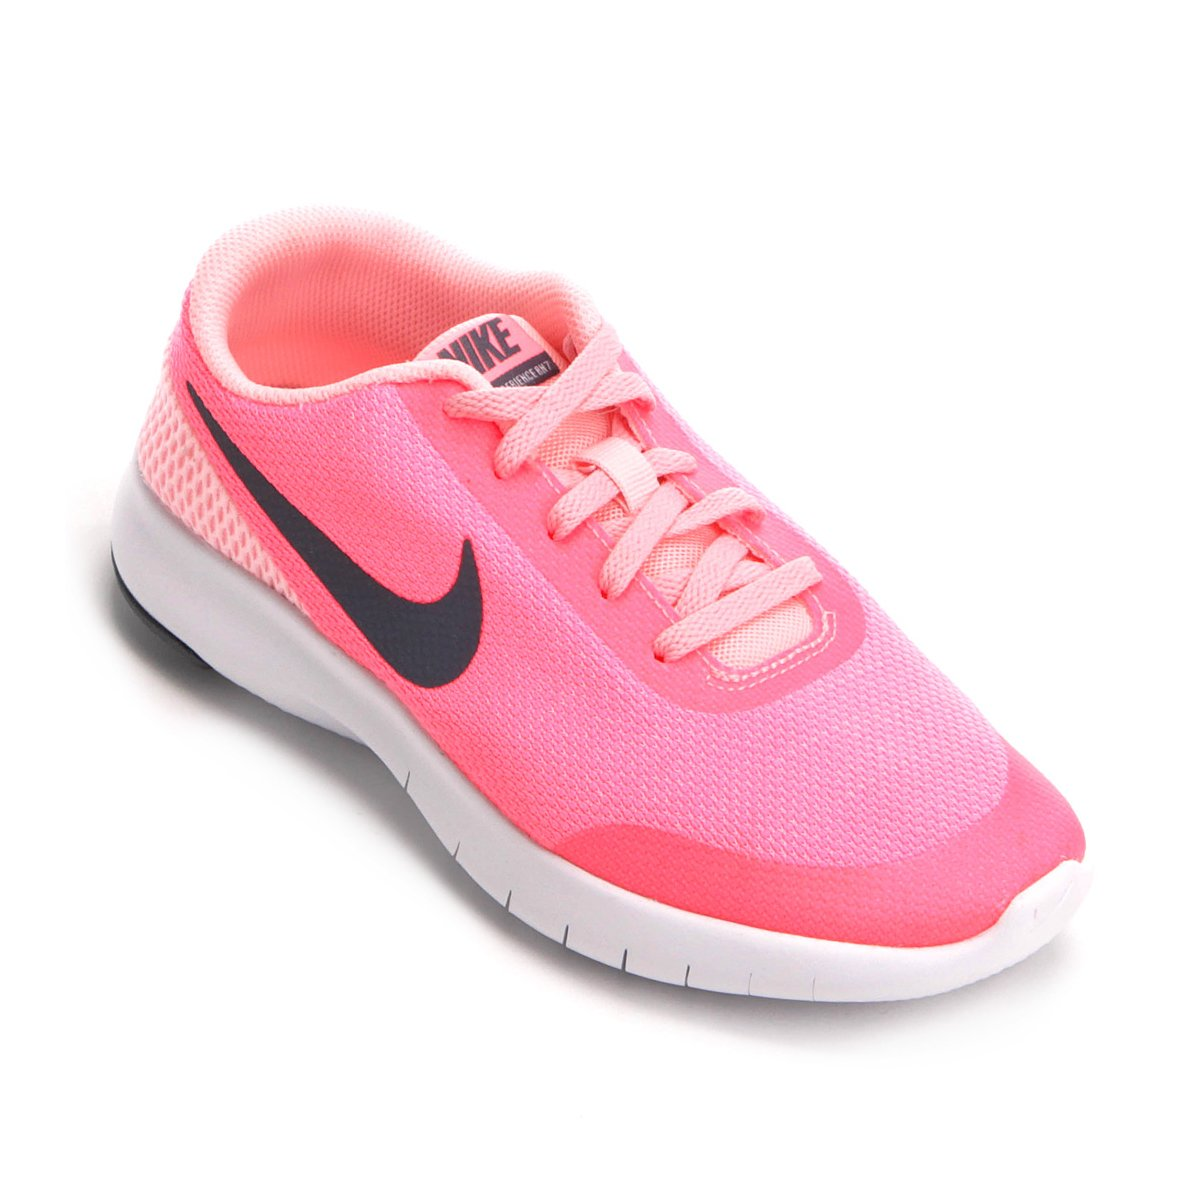 5cf4200b769 Tênis Infantil Nike Flex Experience Rn Feminino - Pink e Cinza - Compre  Agora